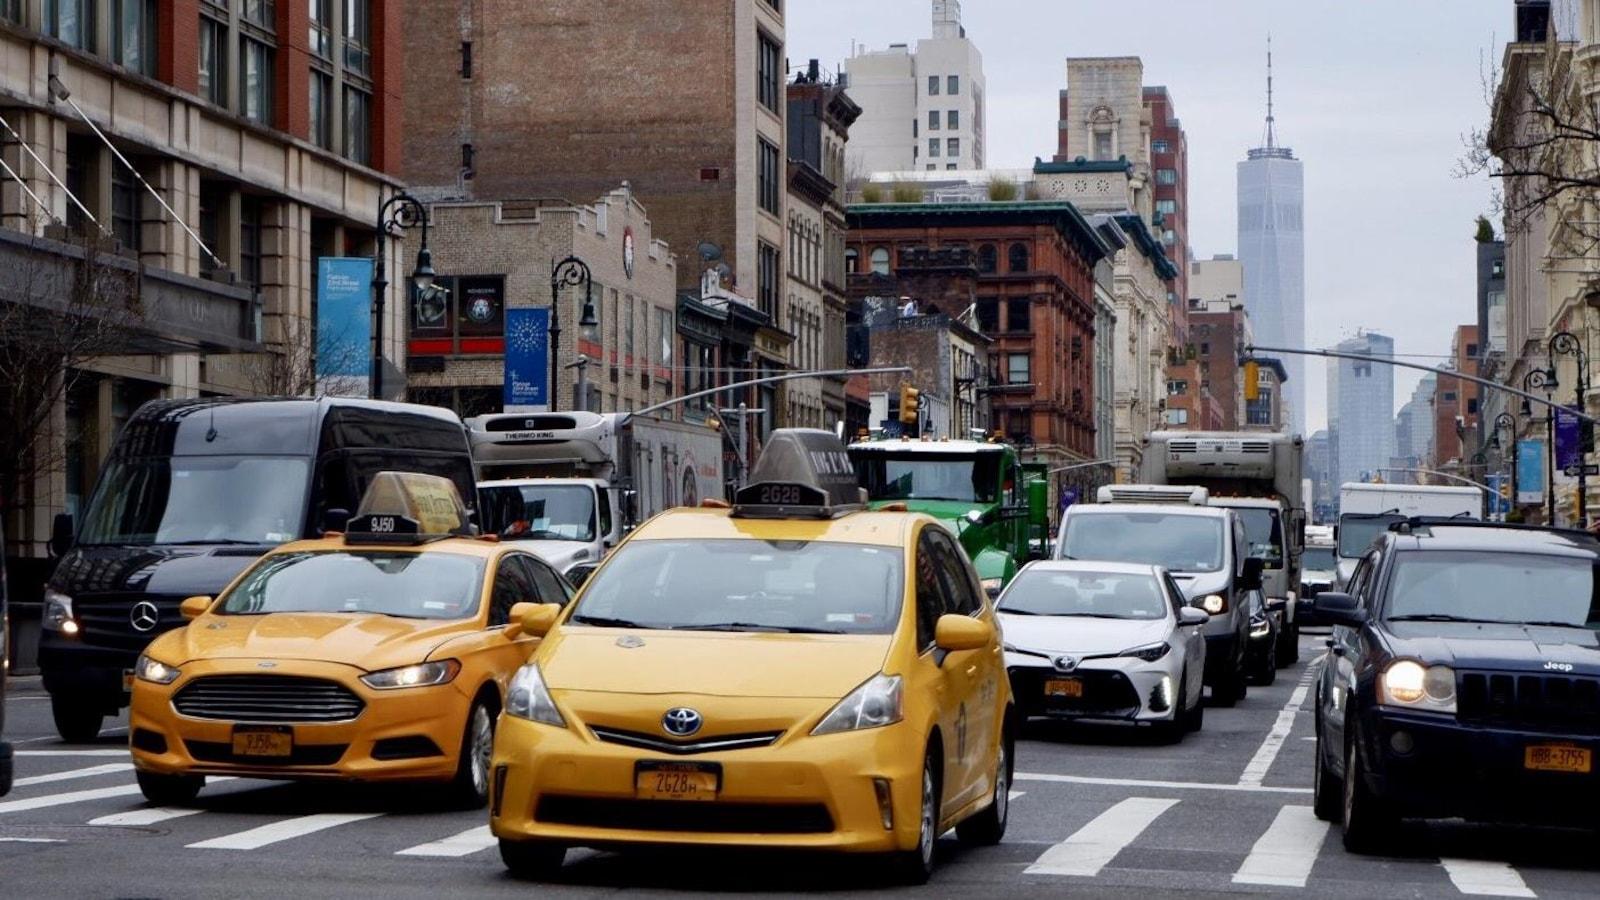 New York mettra bientôt en place un système de péage urbain.